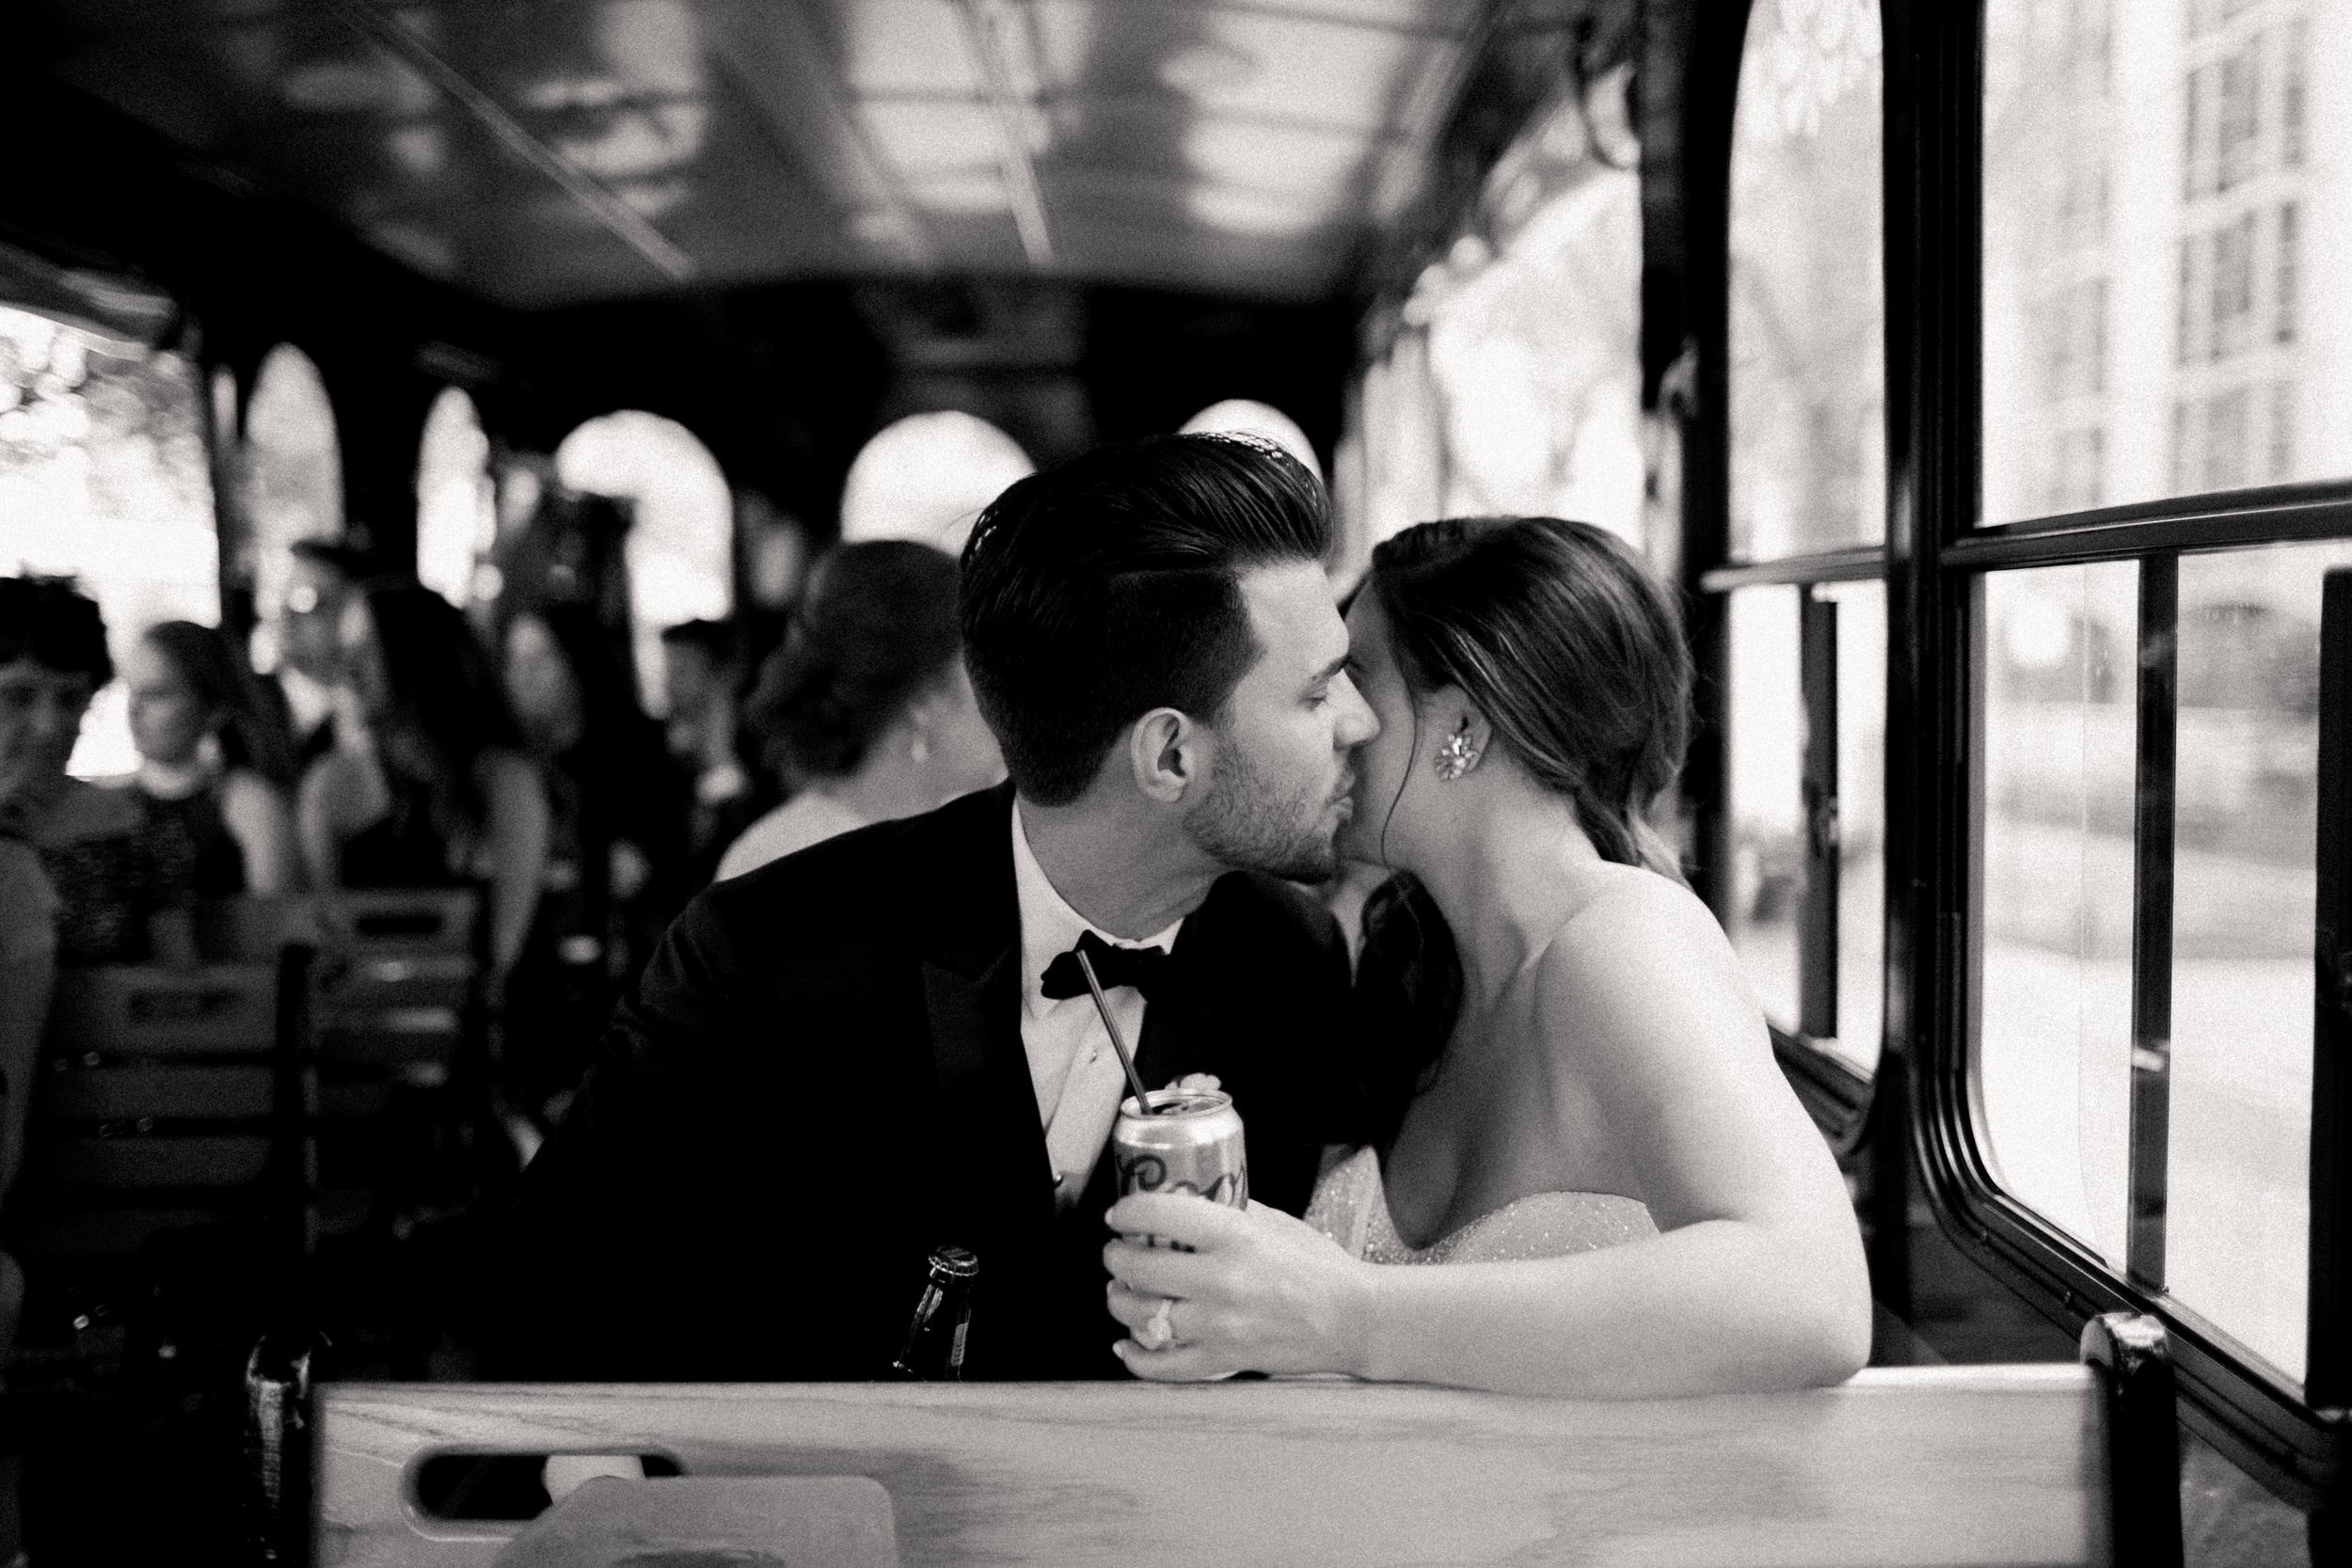 mayden_photography_weddings-64.jpg